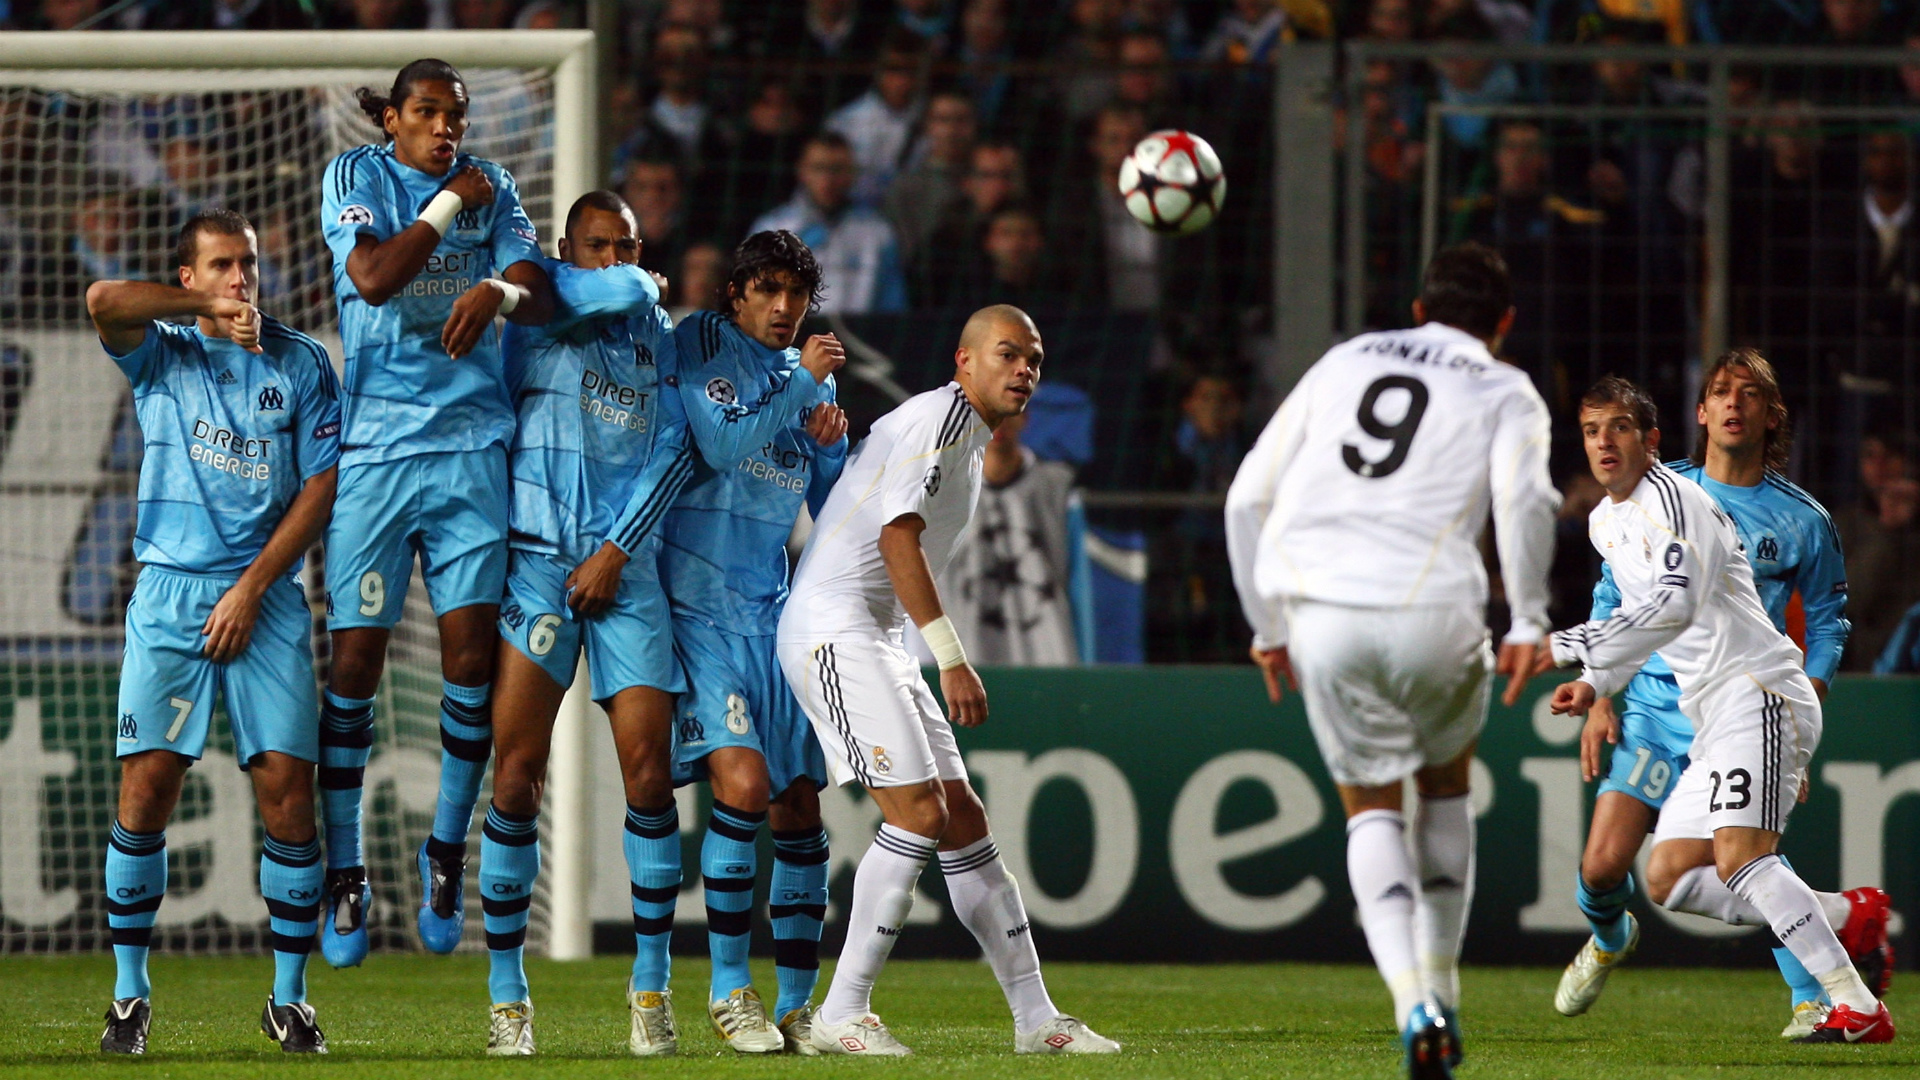 Zinedine Zidane dejó fuera de la convocatoria a Cristiano Ronaldo